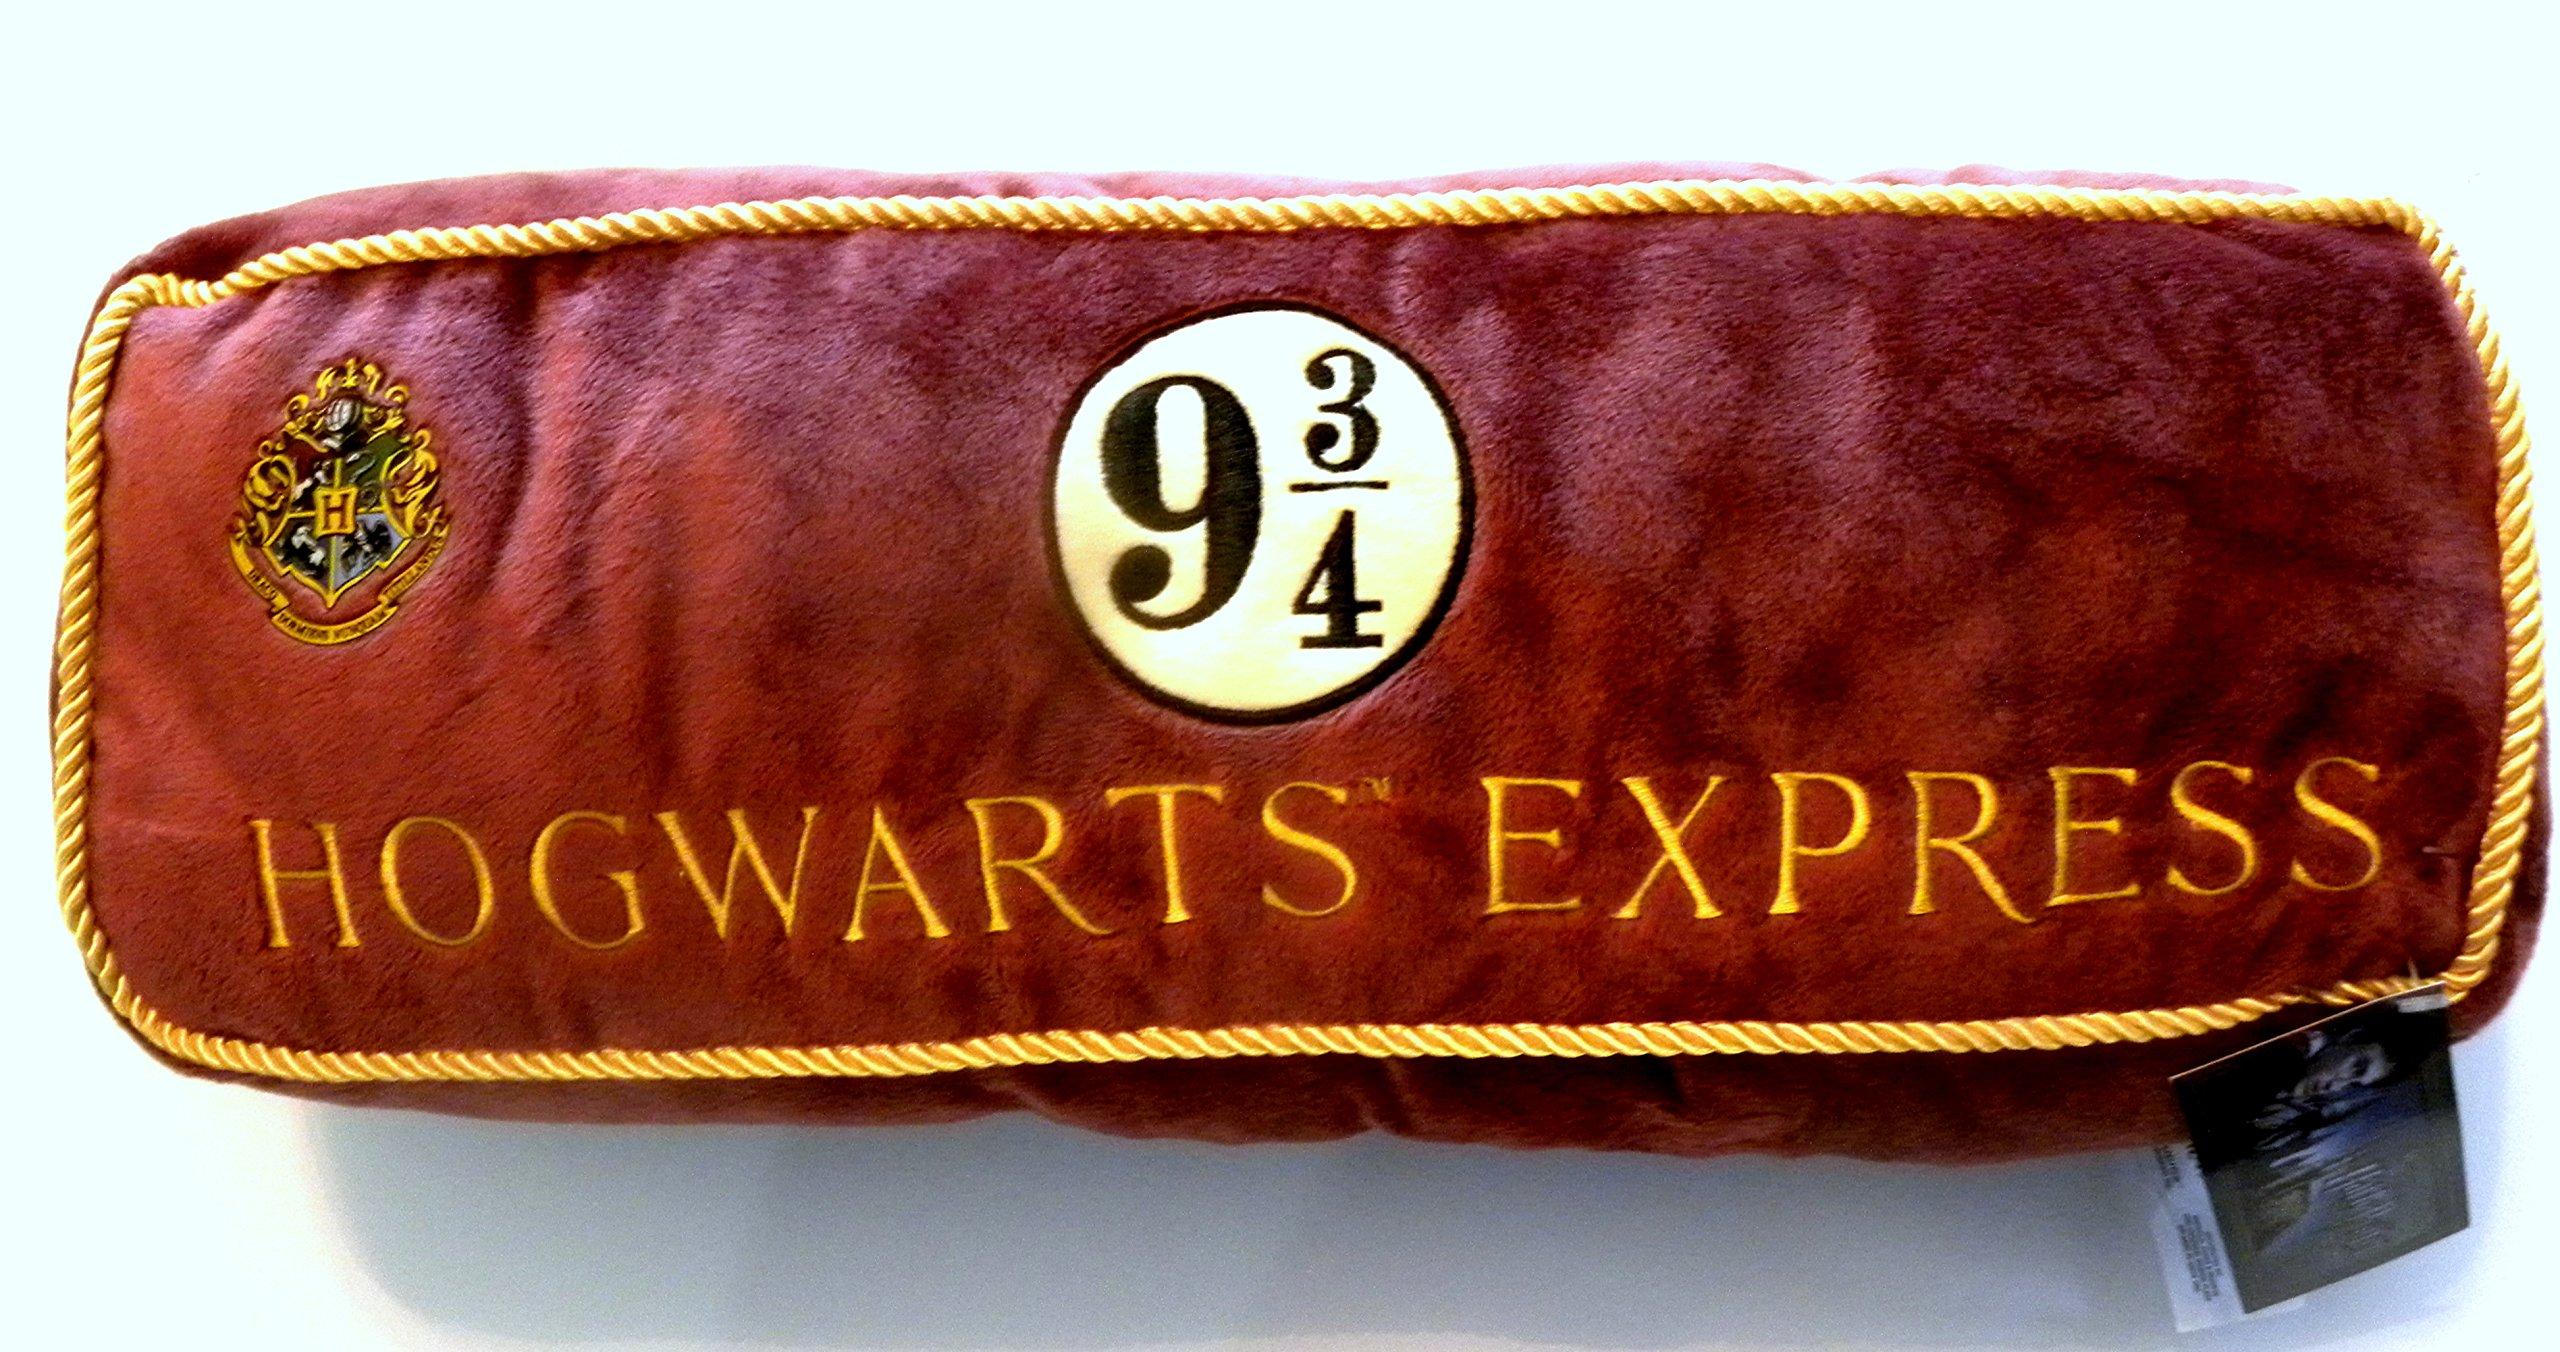 Universal Studios Wizarding World of Harry Potter Diagon Alley Luxurious Plush Pillow Hogwarts Express 9 3/4 Train